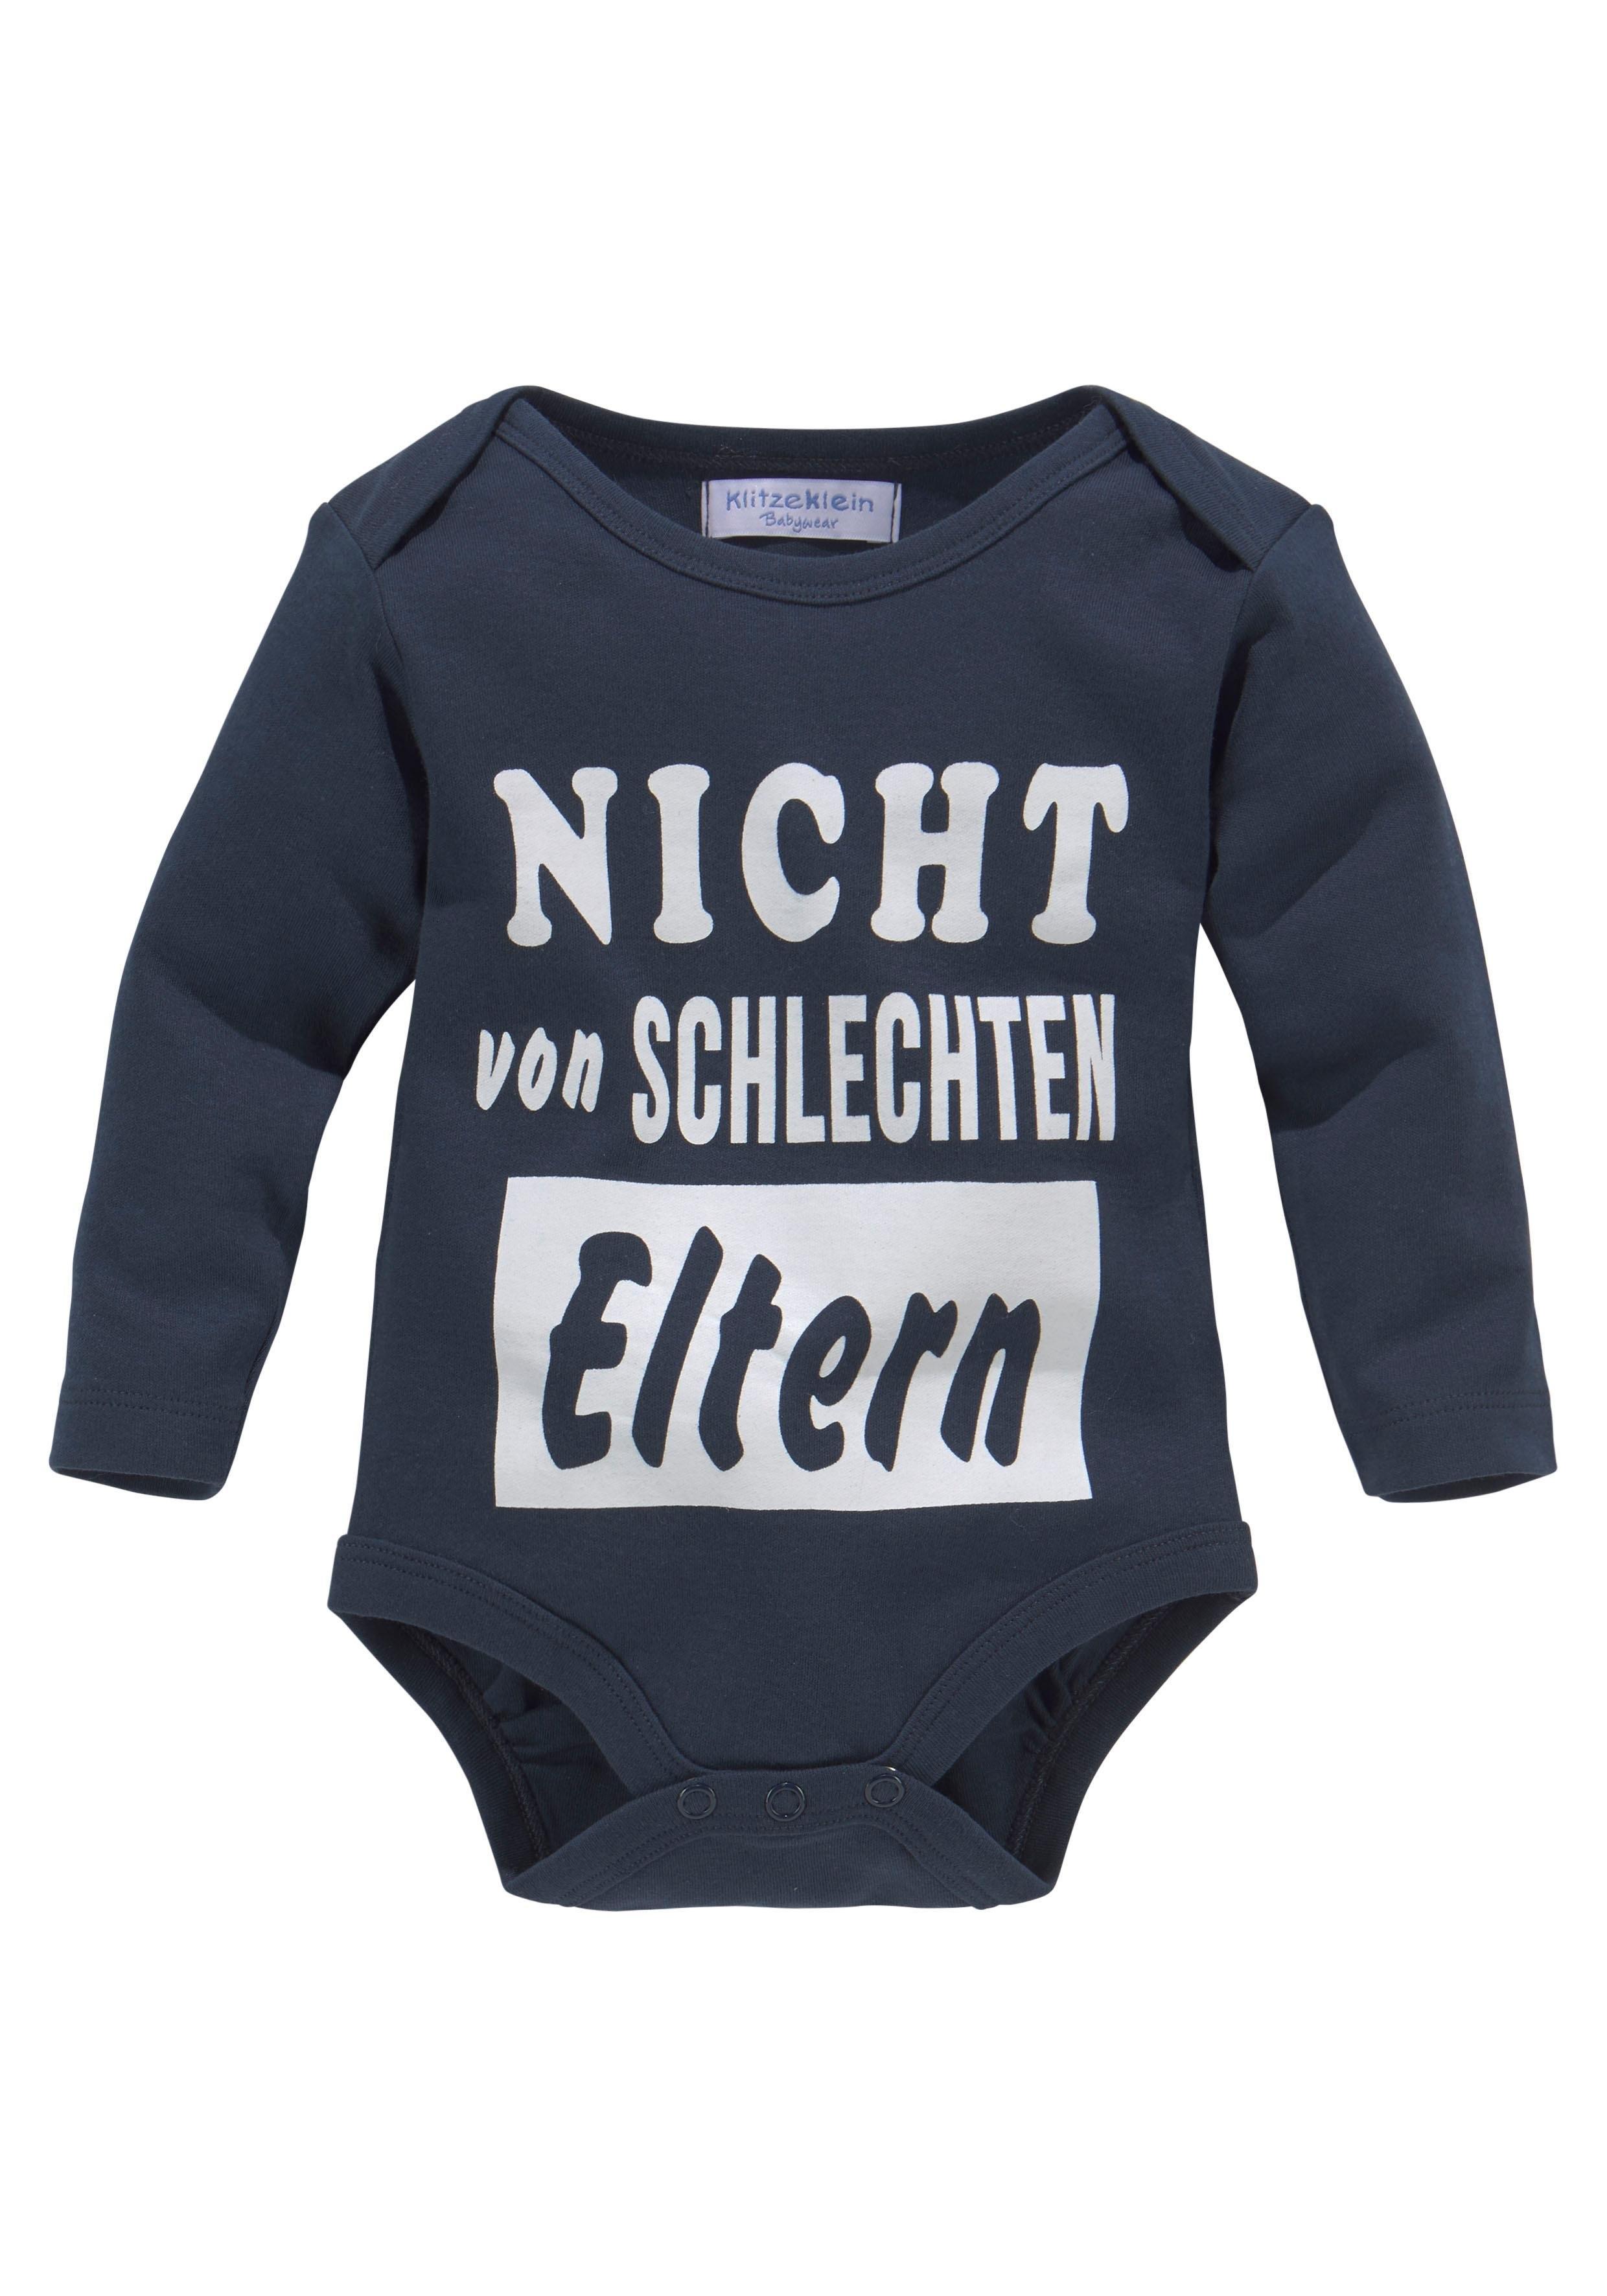 KlitzeKlein body met lange mouwen »Nicht von schlechten Eltern« goedkoop op otto.nl kopen